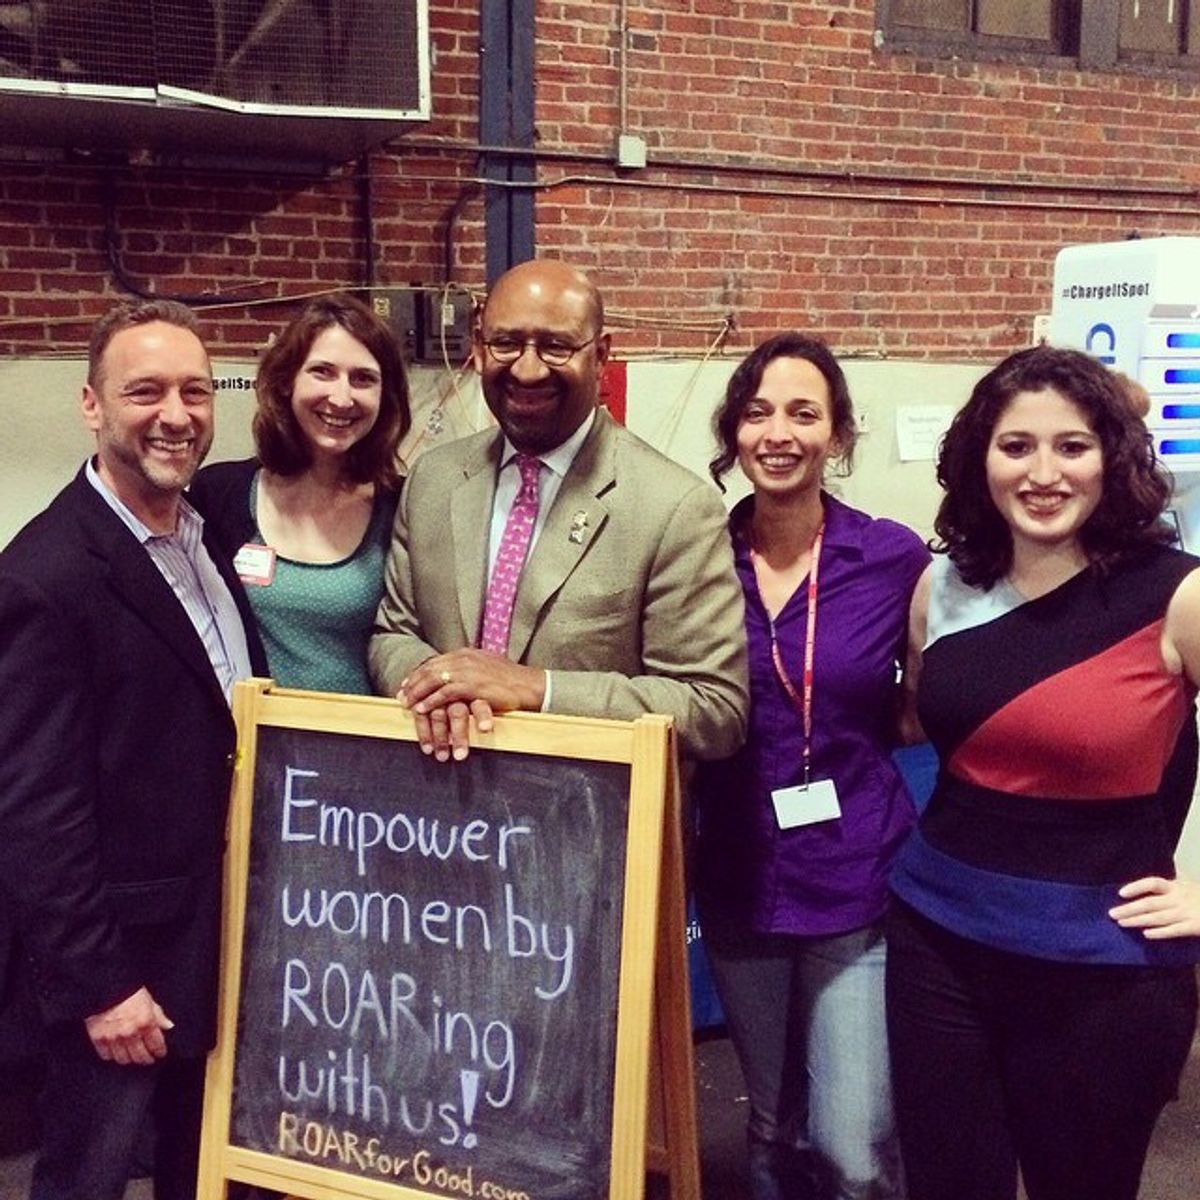 Interview: ROAR For Good Co-Founder Talks Sexual Assault Prevention And Social Impact Entrepreneurship